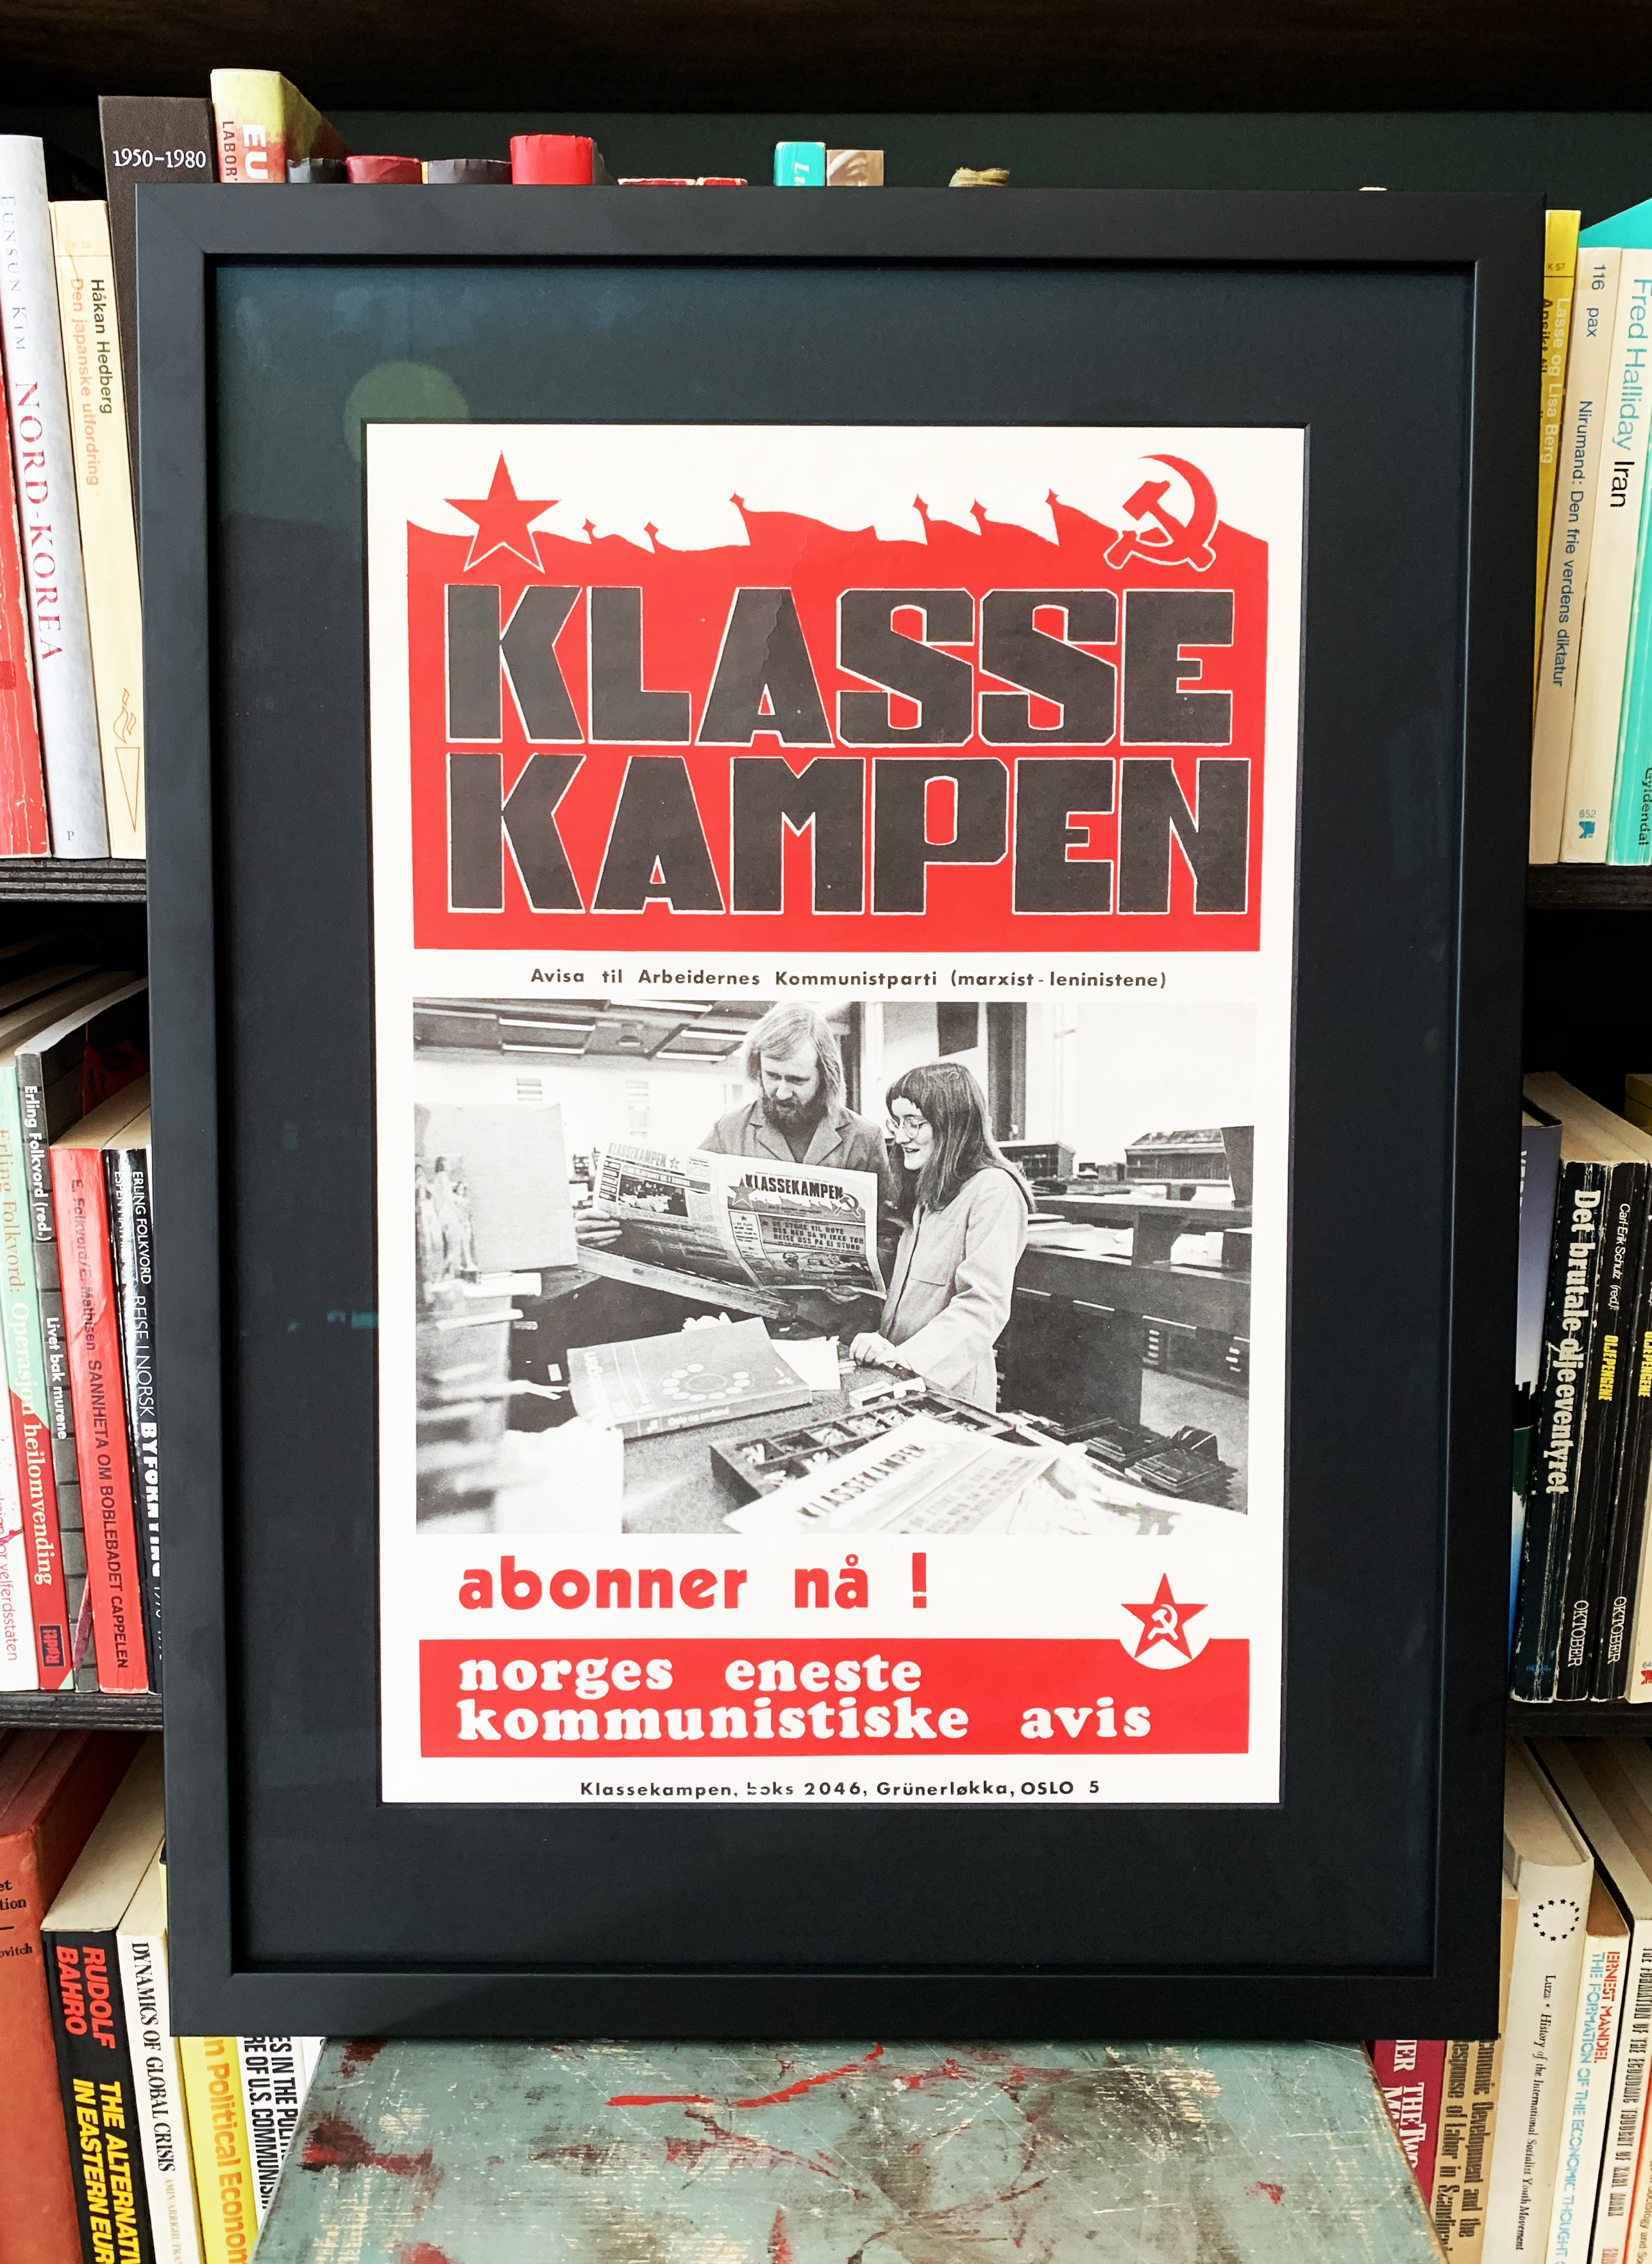 Klassekampen - abonner nå! (ca. 1975)